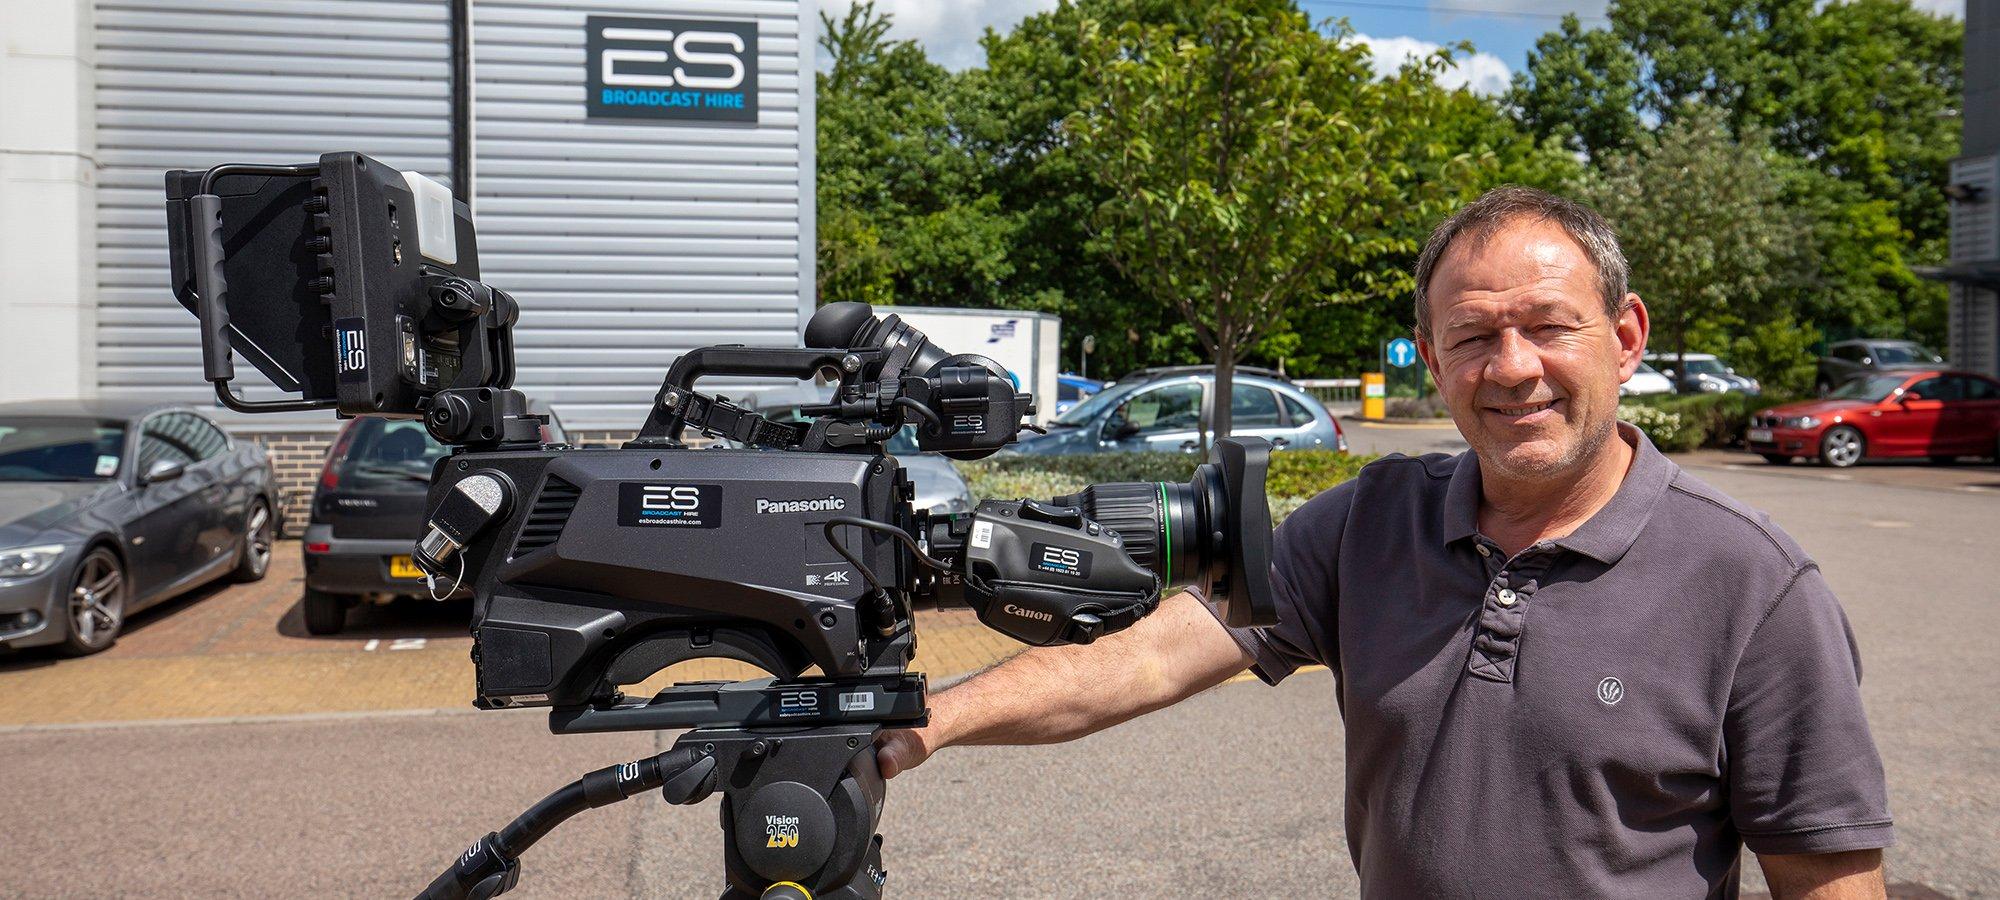 Warren Taggart with Panasonic AK-UC4000 4K systems camera